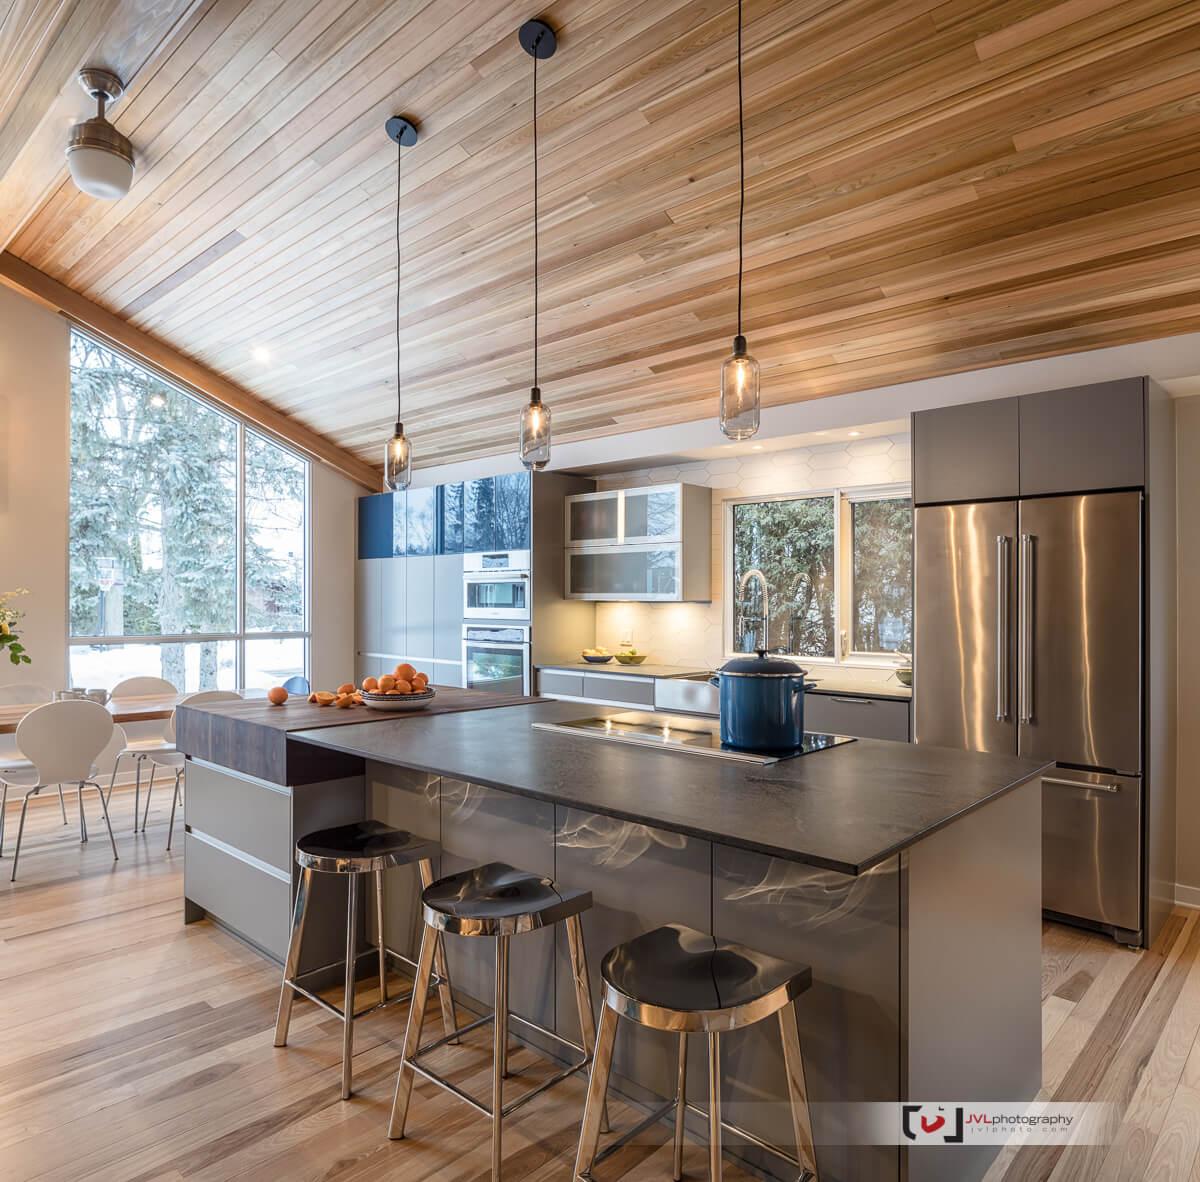 Ottawa Interior Photography: Kitchens By Astro Design